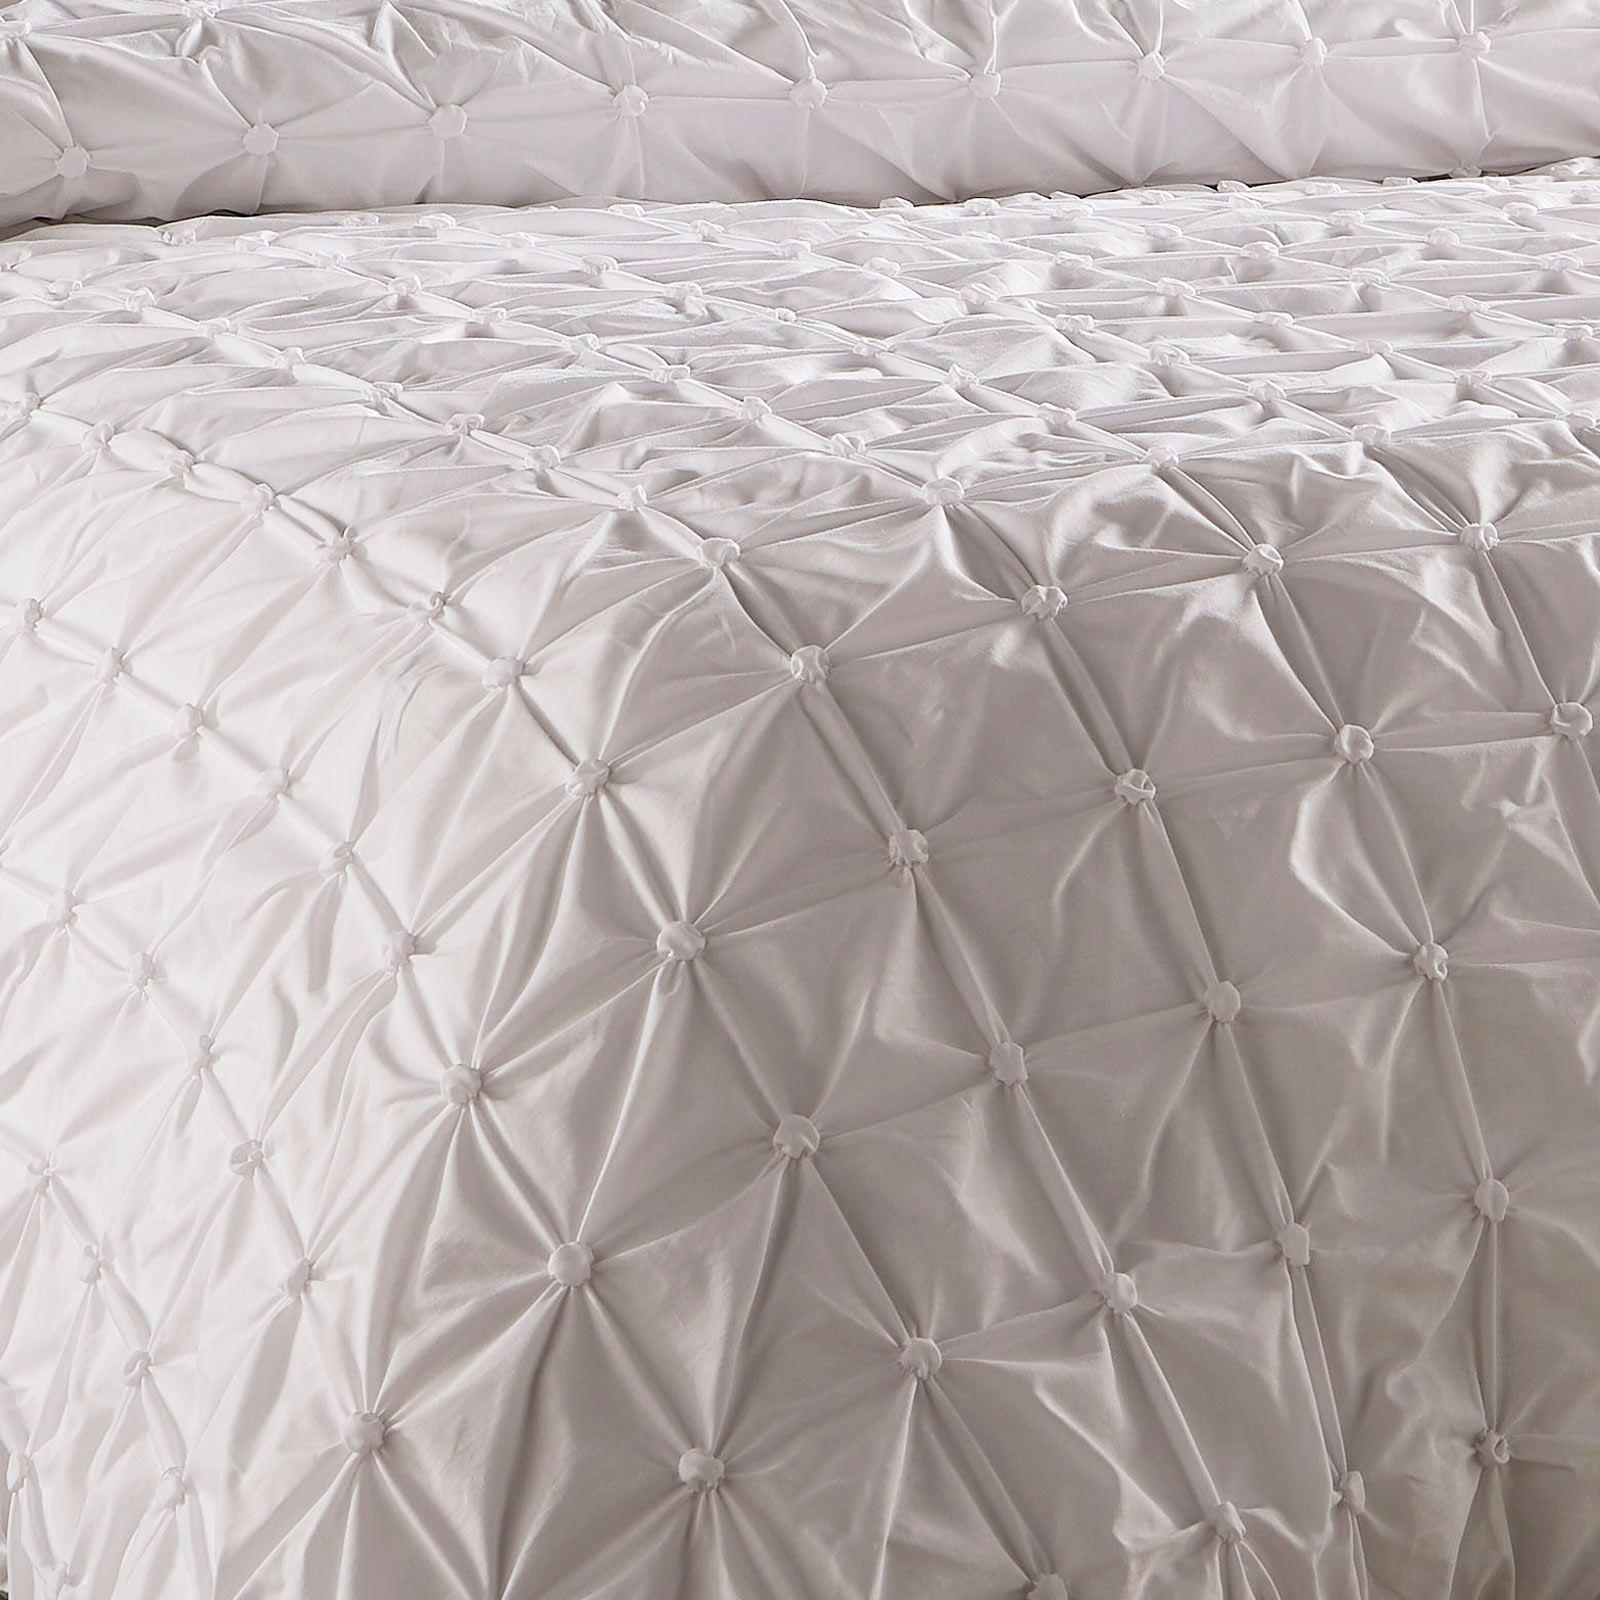 Pleated-Duvet-Covers-Seville-Pintuck-Luxury-Cotton-Rich-Quilt-Bedding-Sets thumbnail 11